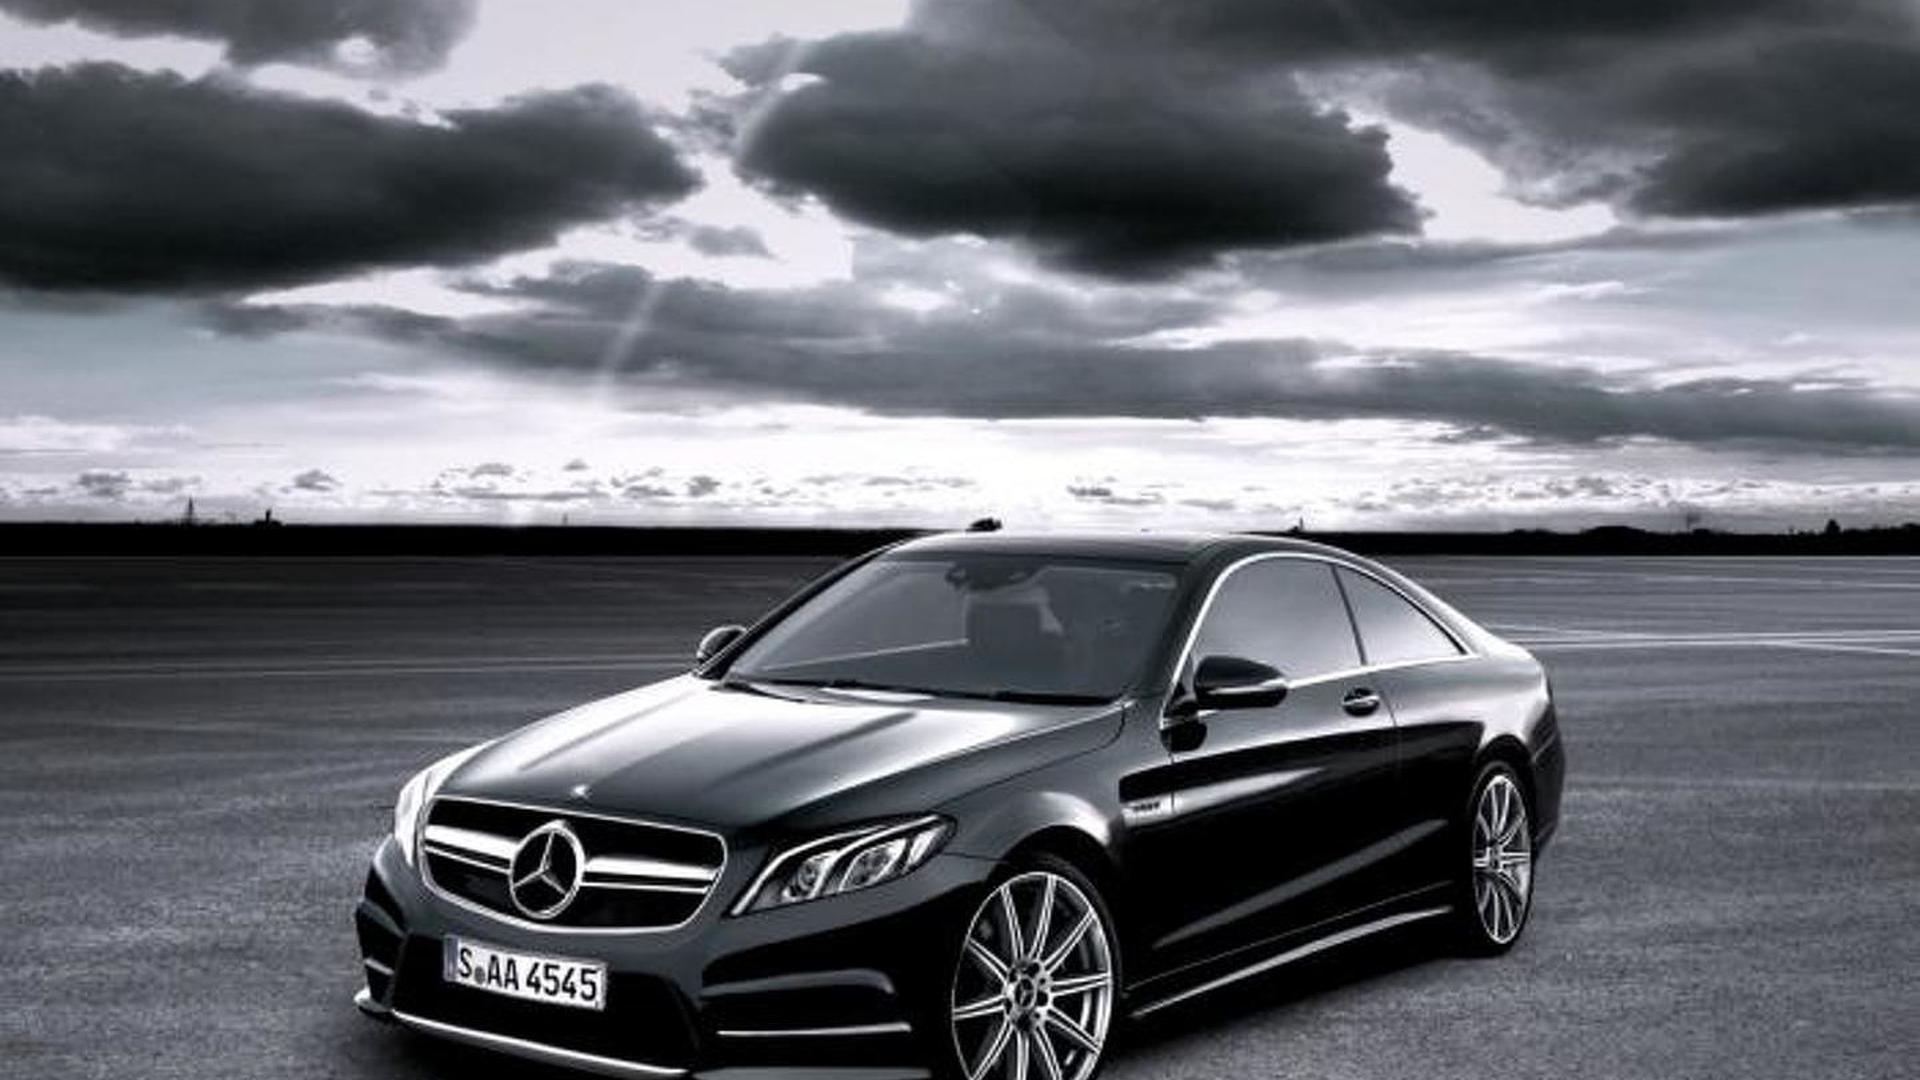 Wcf Reader Envisions Next Gen Mercedes Benz E Class Coupe